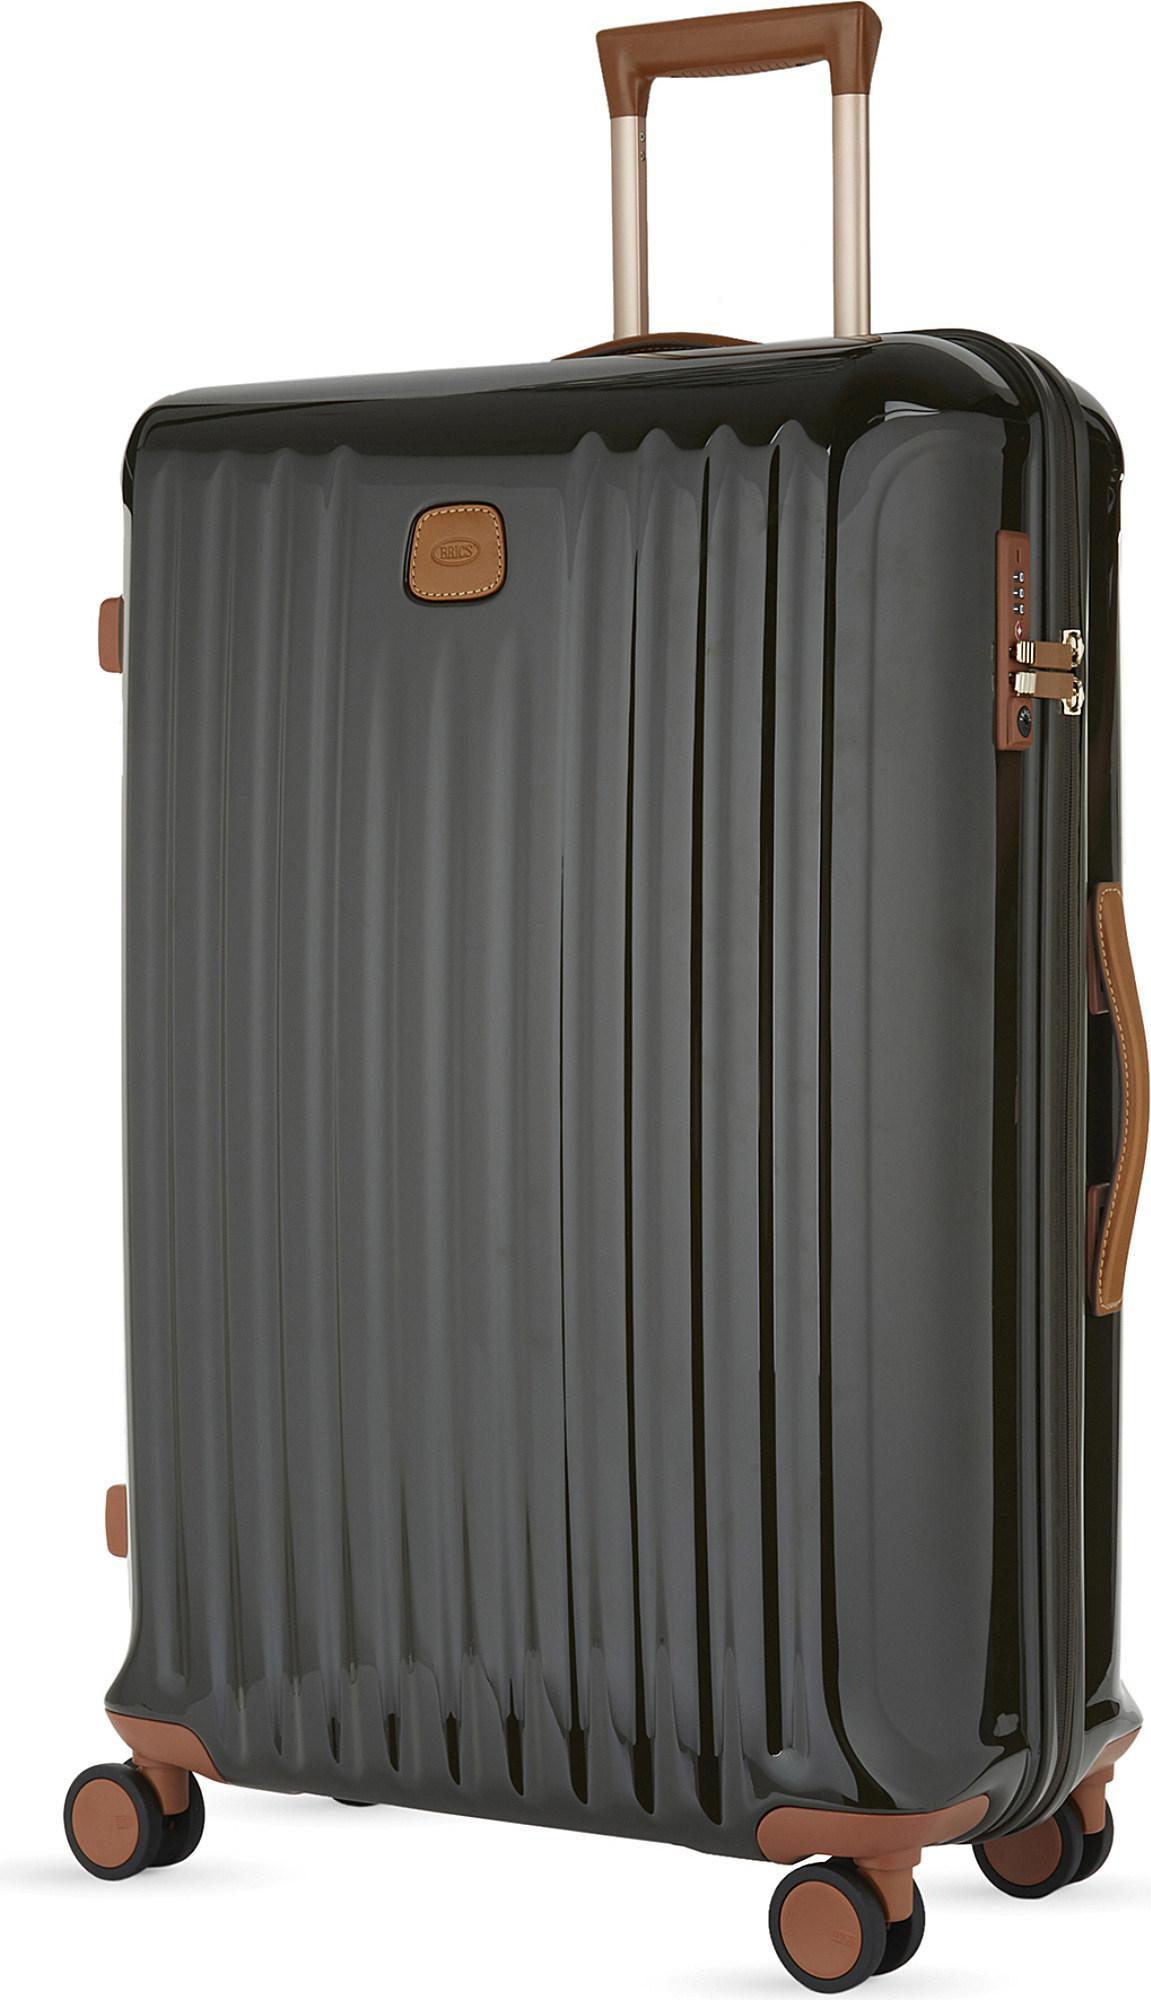 8b19b6da9f43 Lyst - Bric s Capri Four-wheel Trolley Suitcase 78cm in Green for Men